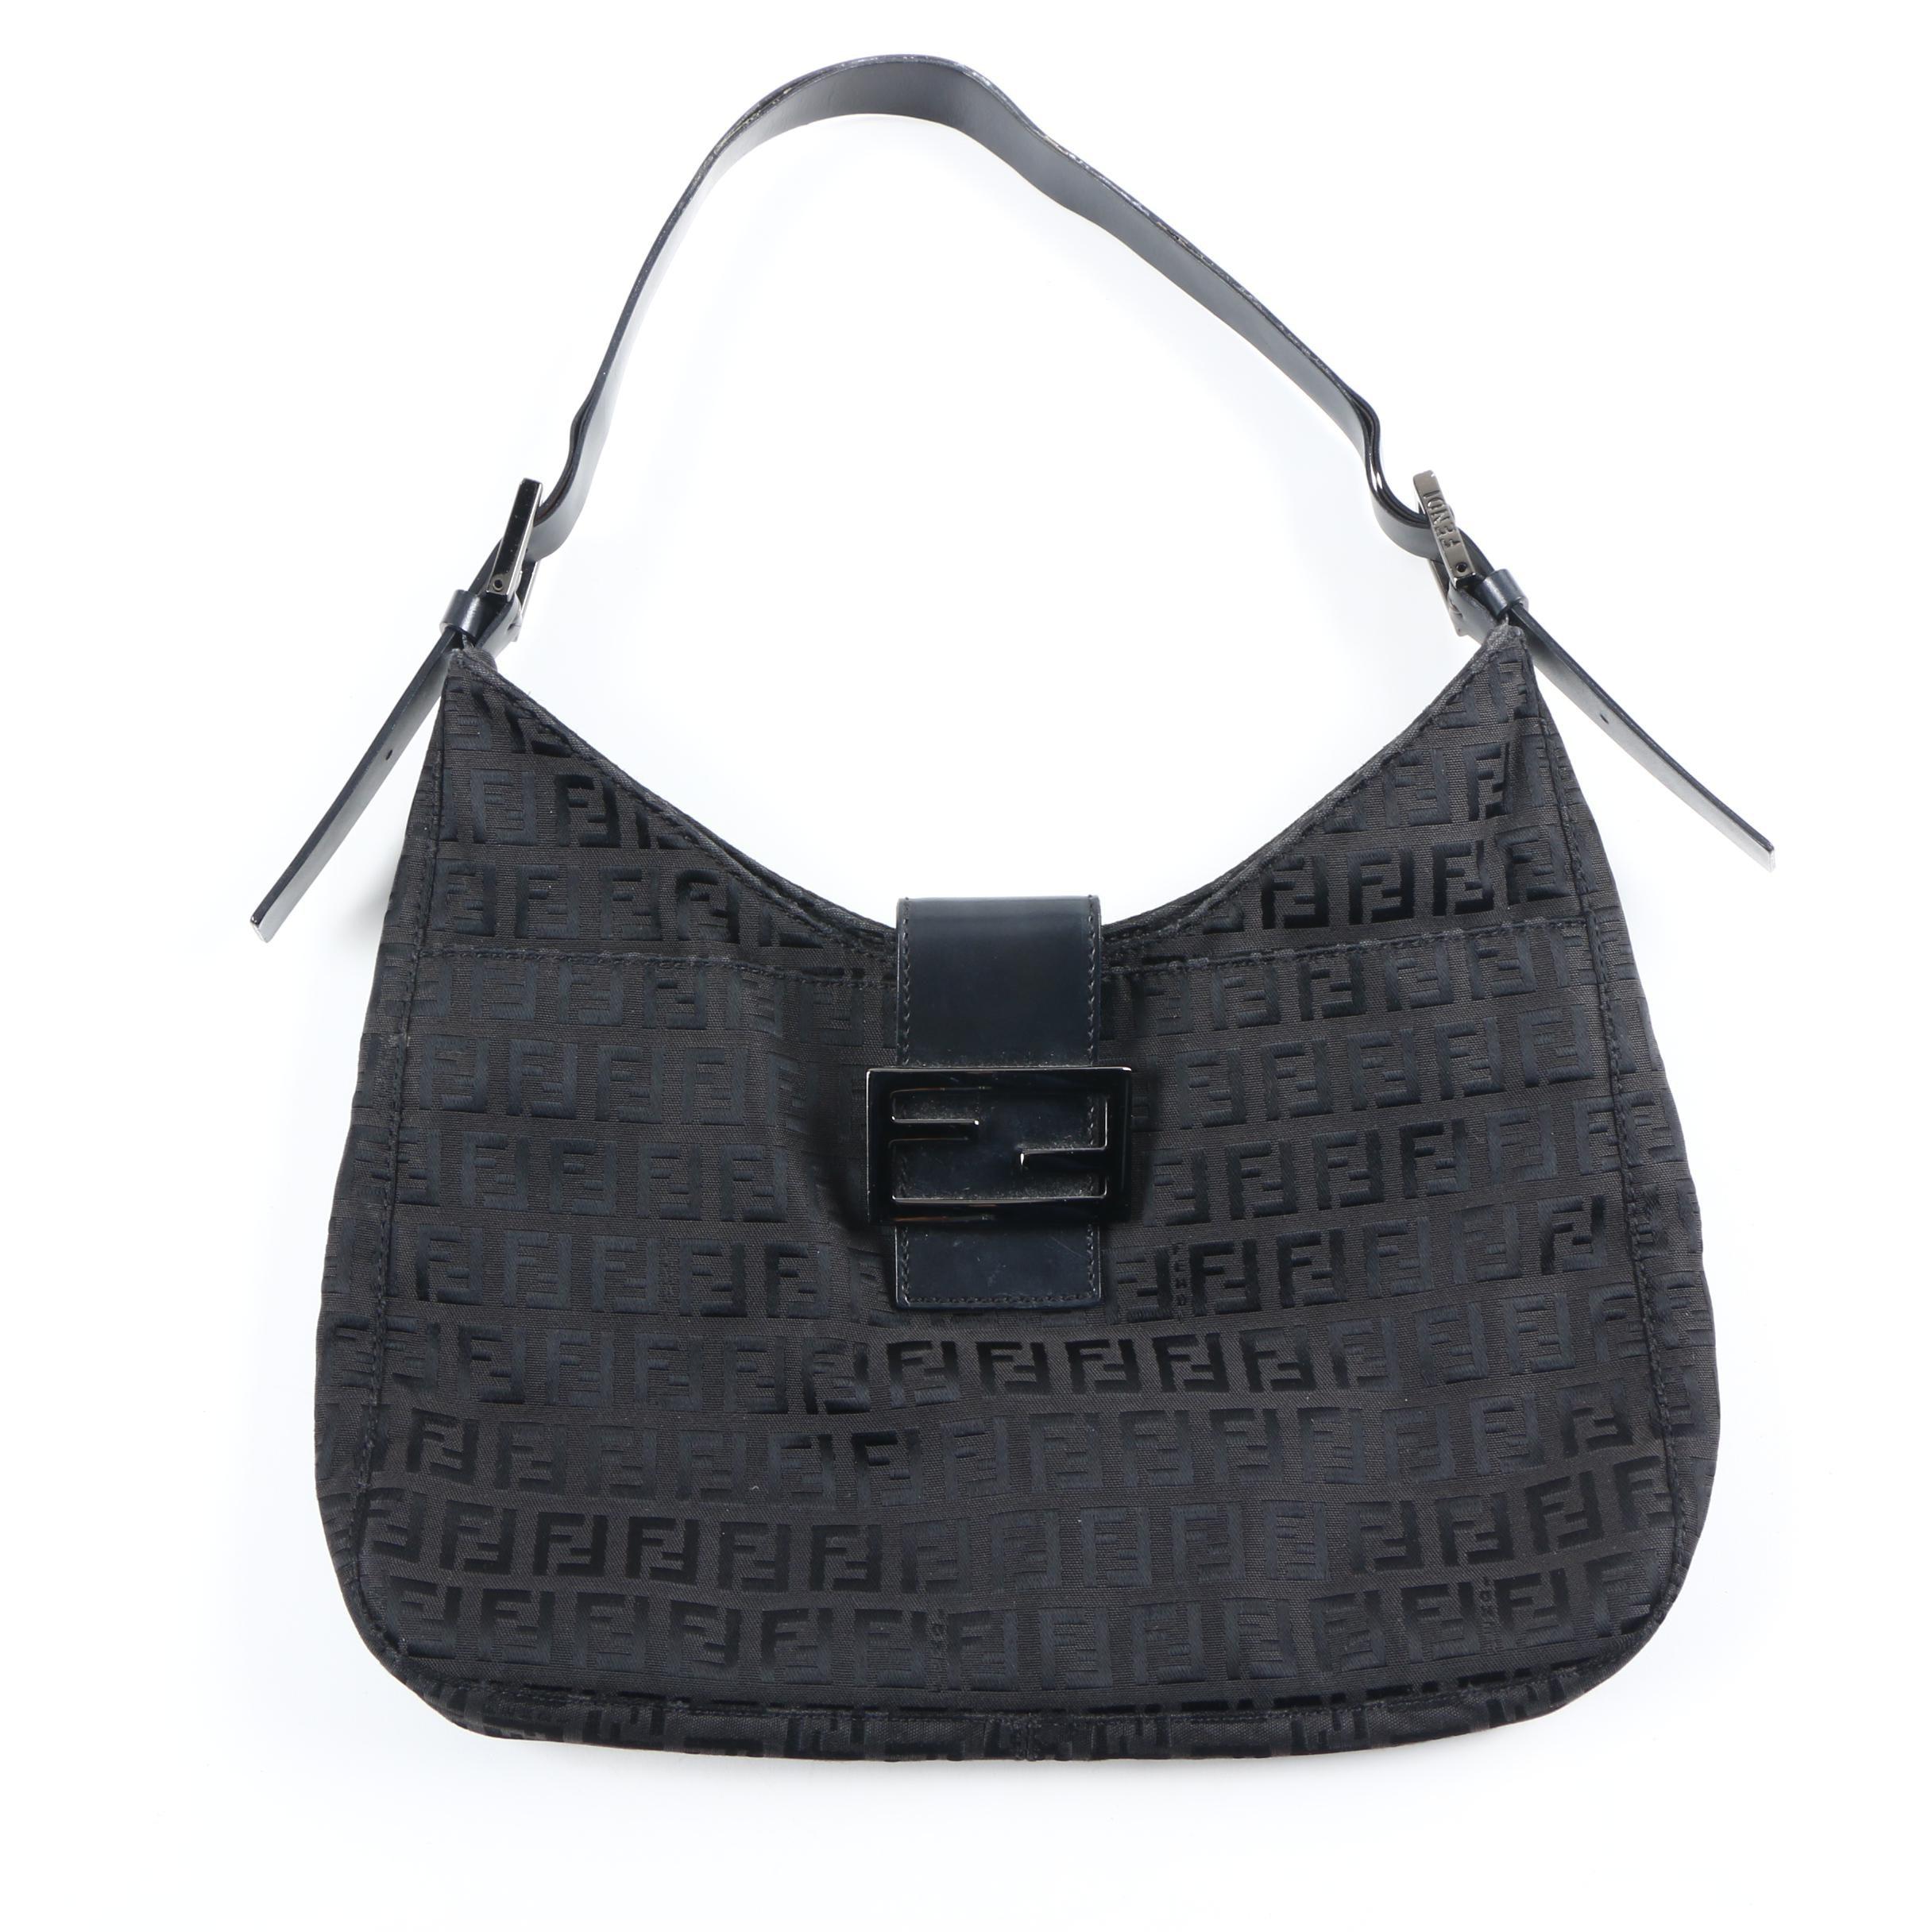 Fendi Black Canvas Handbag